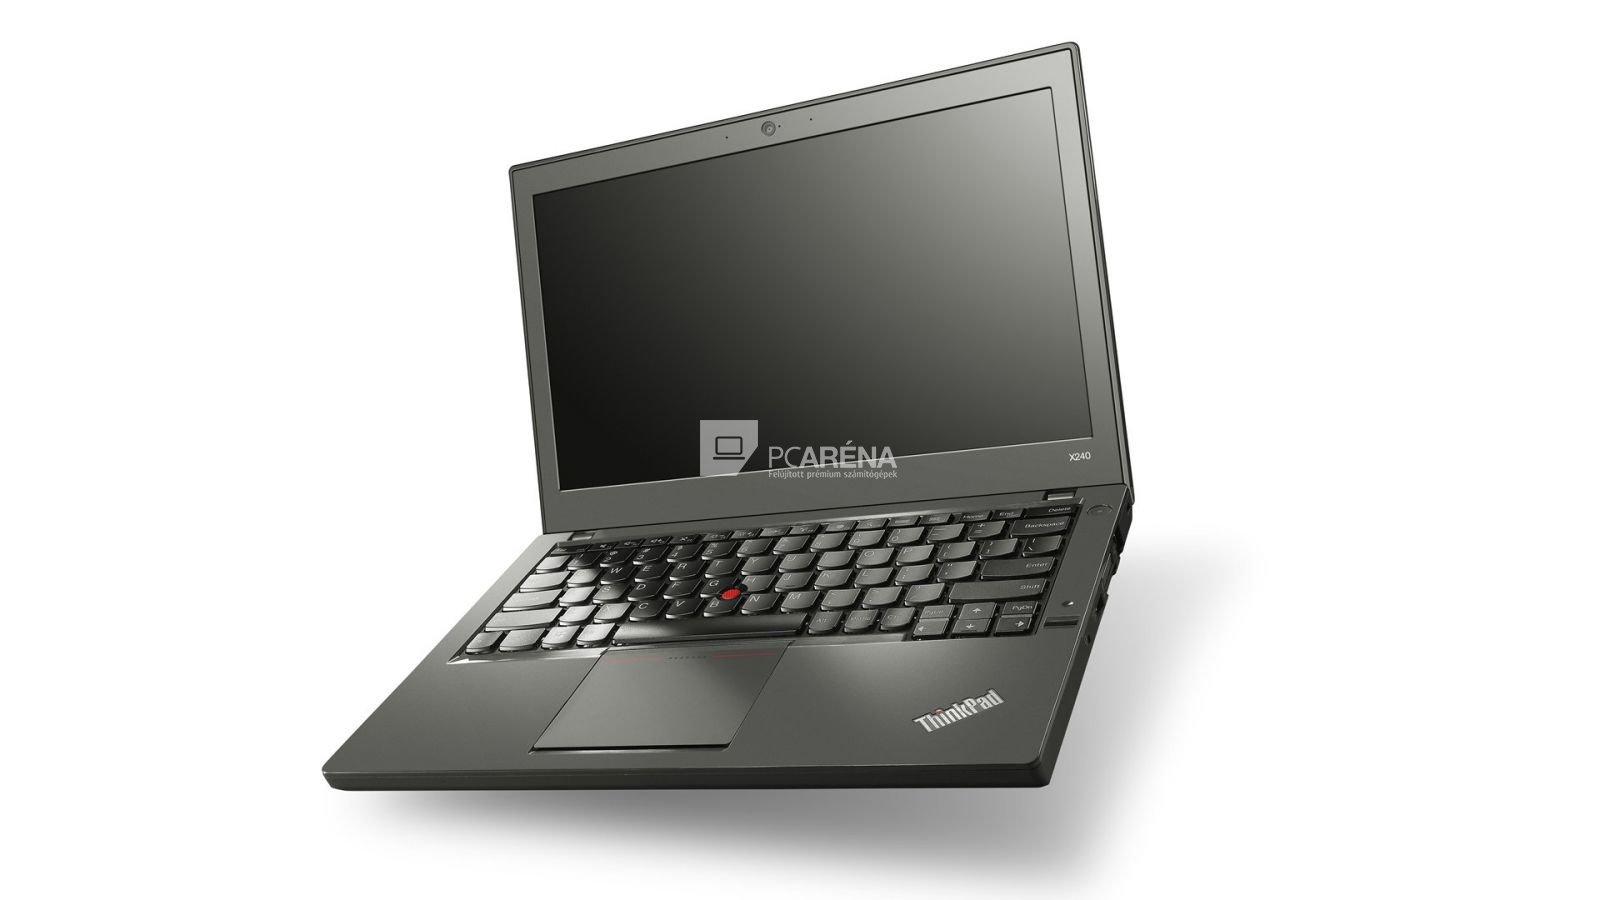 Lenovo ThinkPad X240 laptop